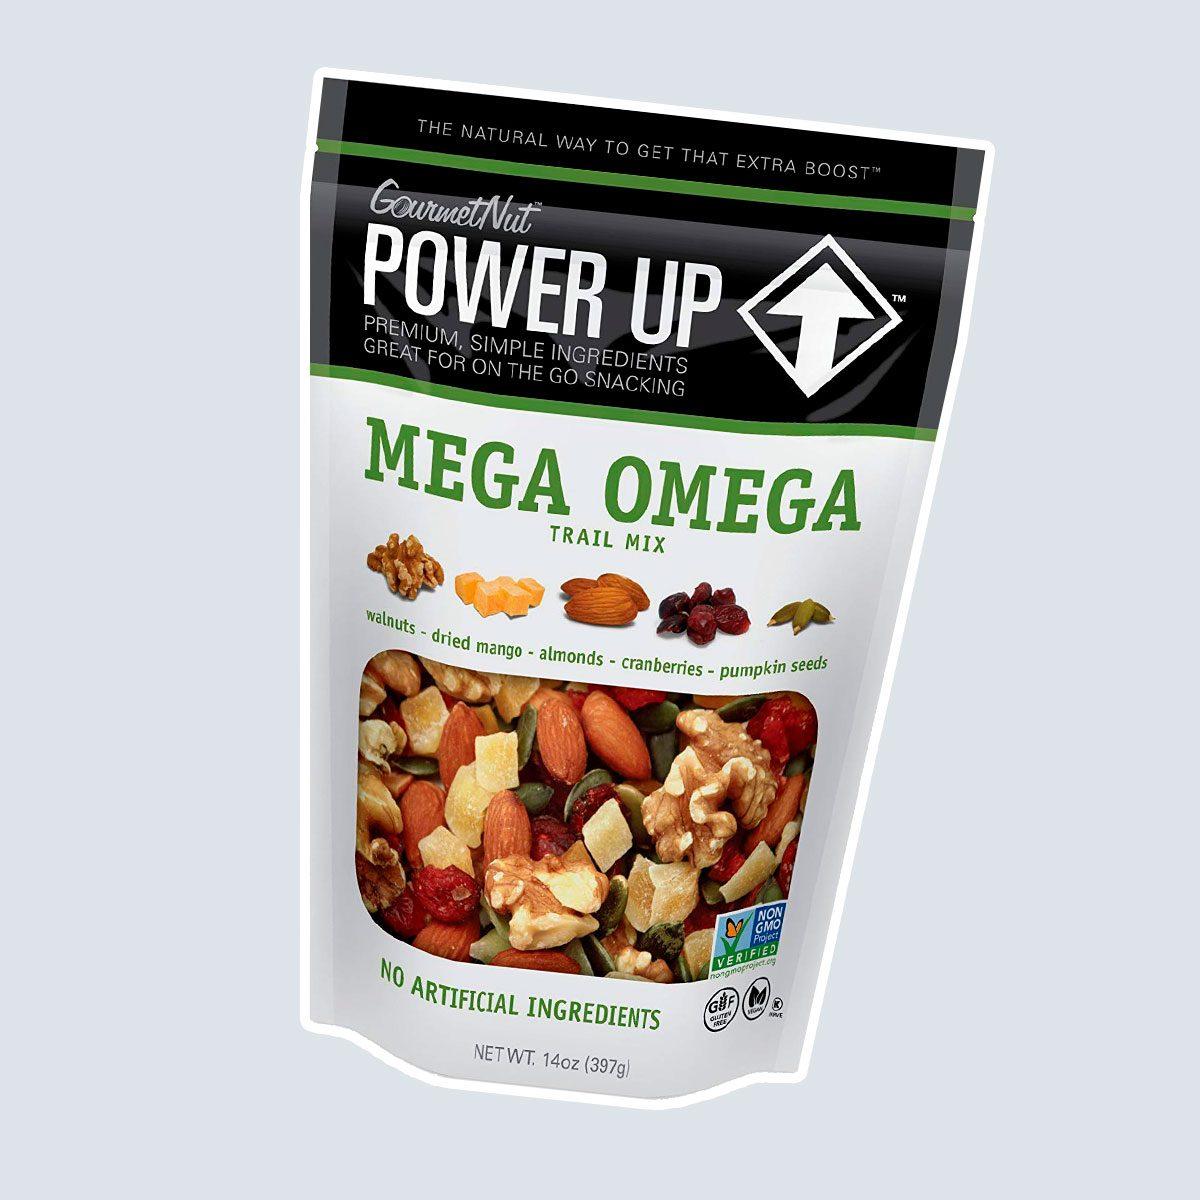 Power Up Mega Omega Trail Mix